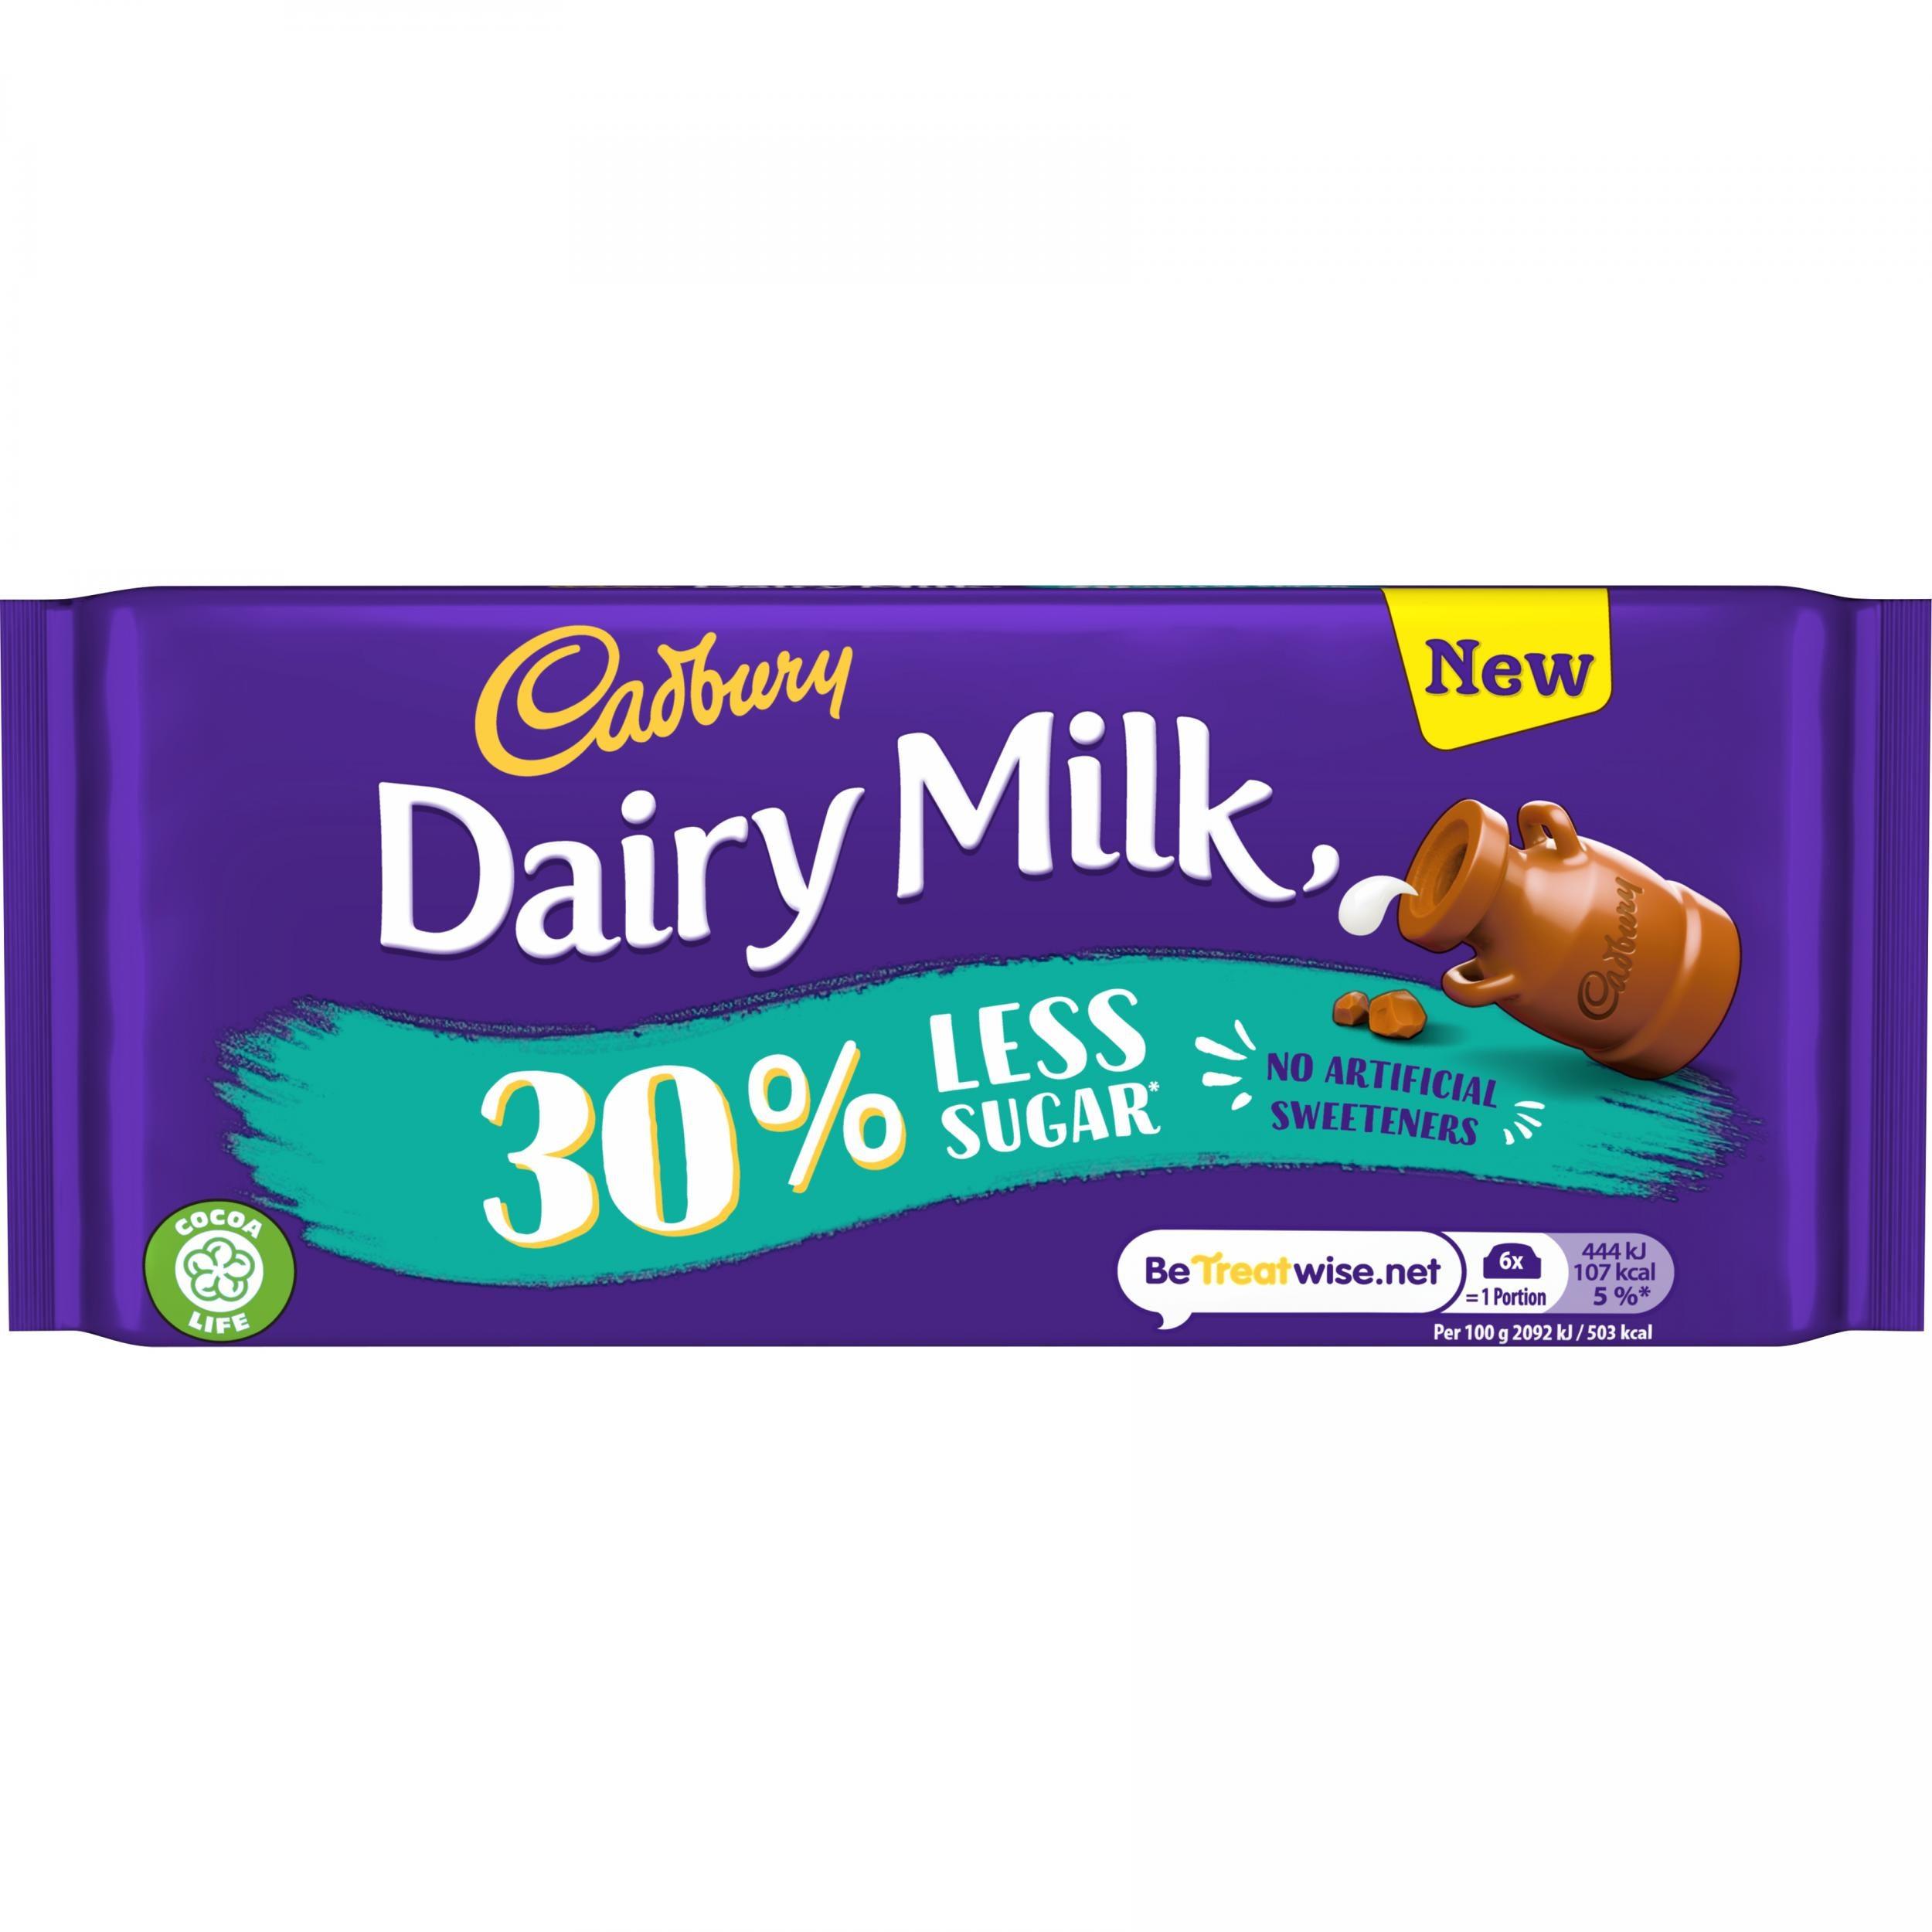 Cadbury's launches new Dairy Milk bar with 30% less sugar